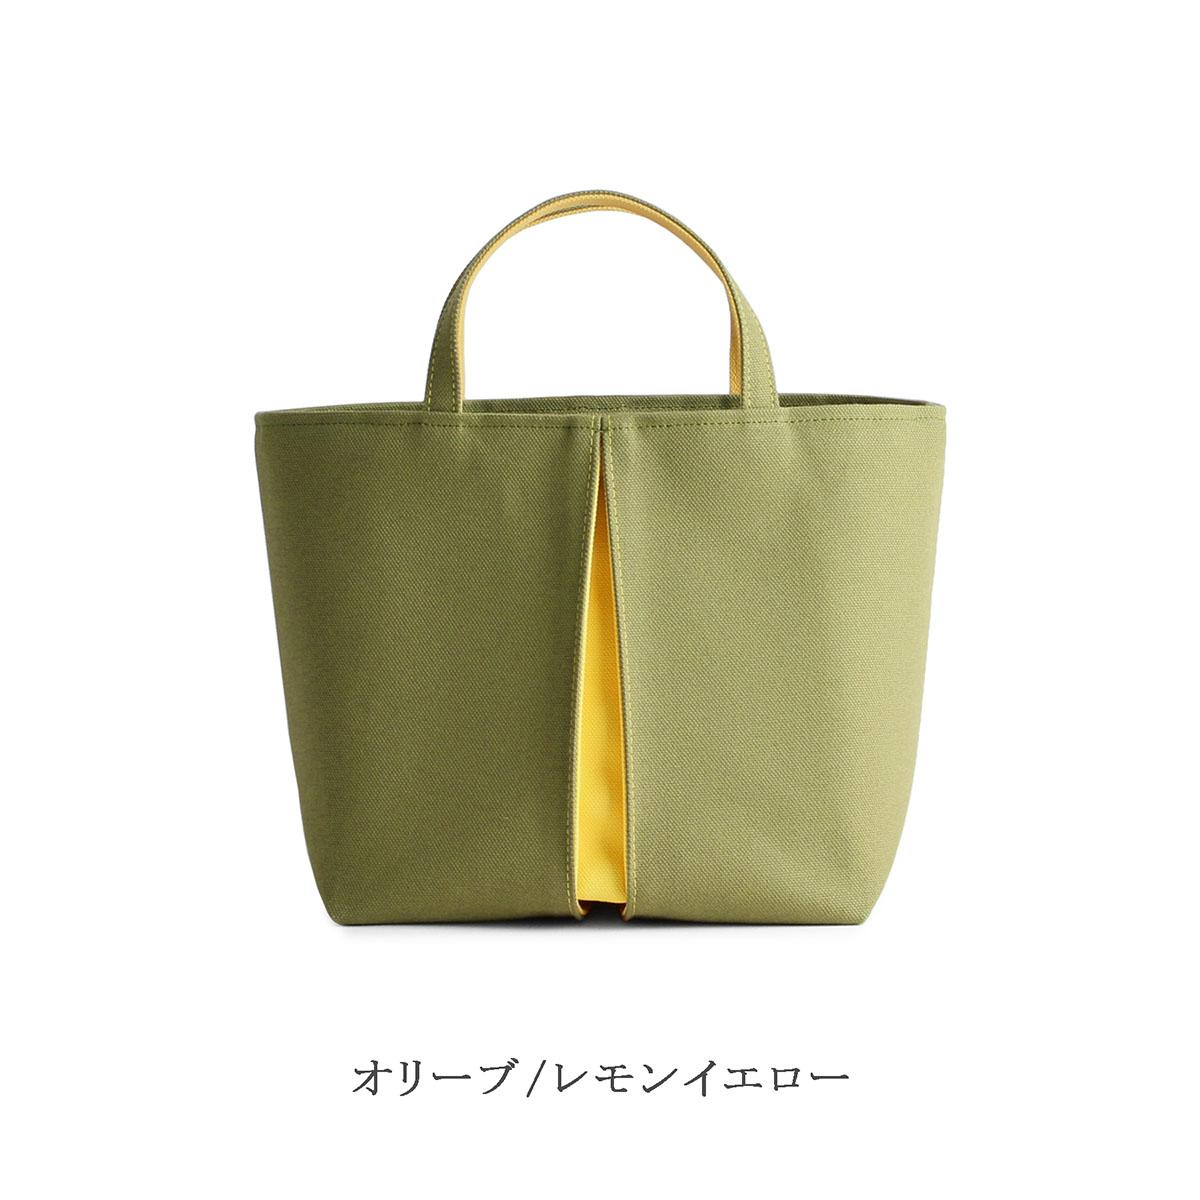 KOSHO ougi pleats 帆布 トートバッグ YT